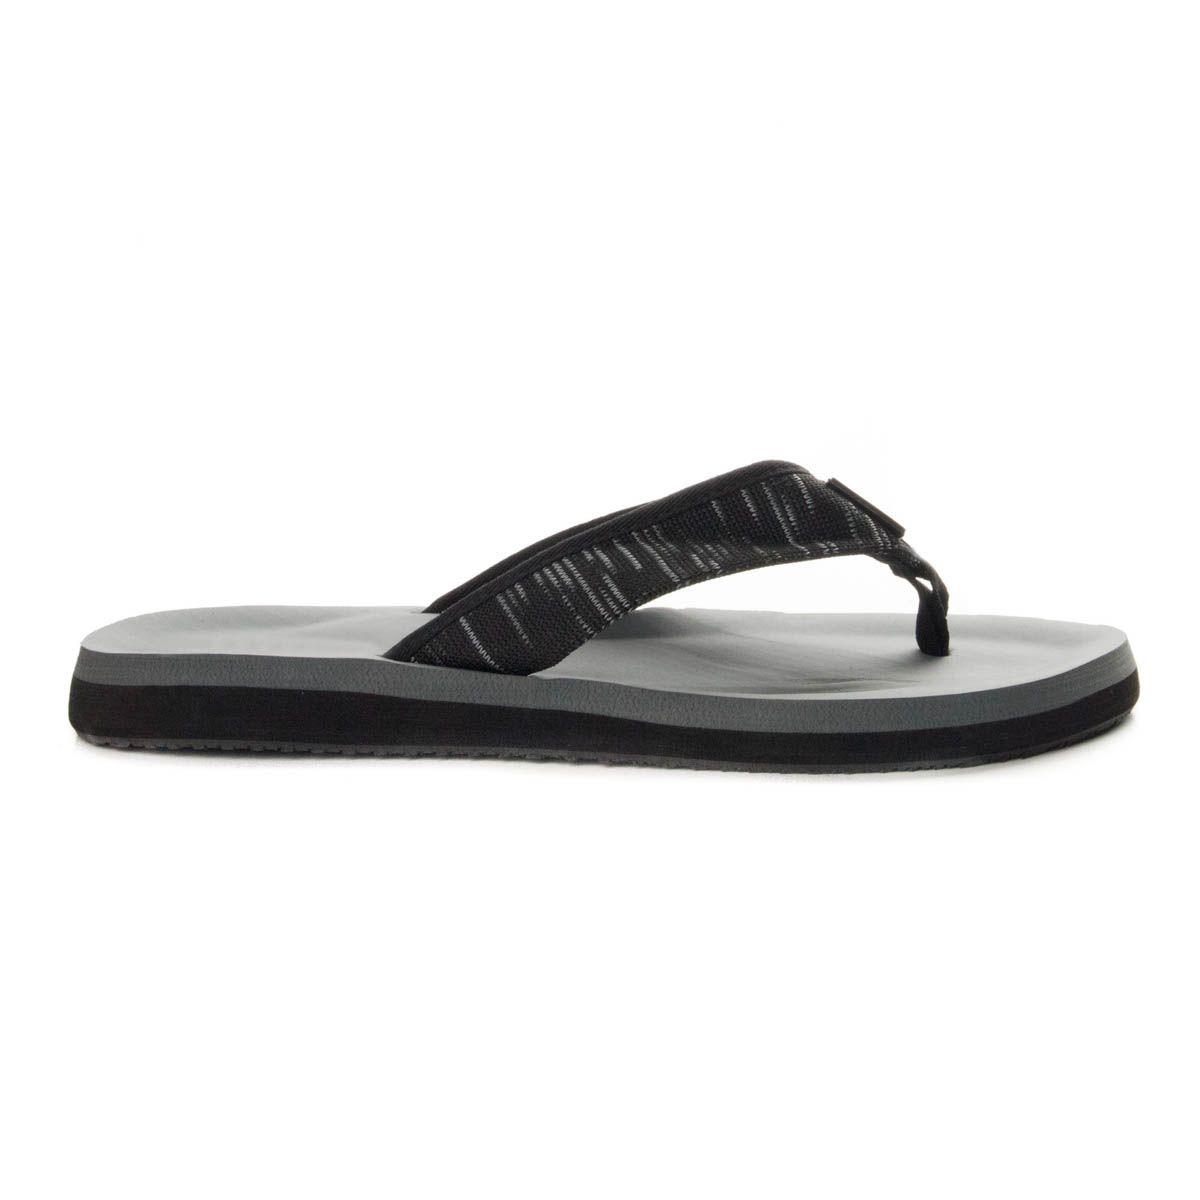 Montevita Fabric Flip Flop in Black Marl